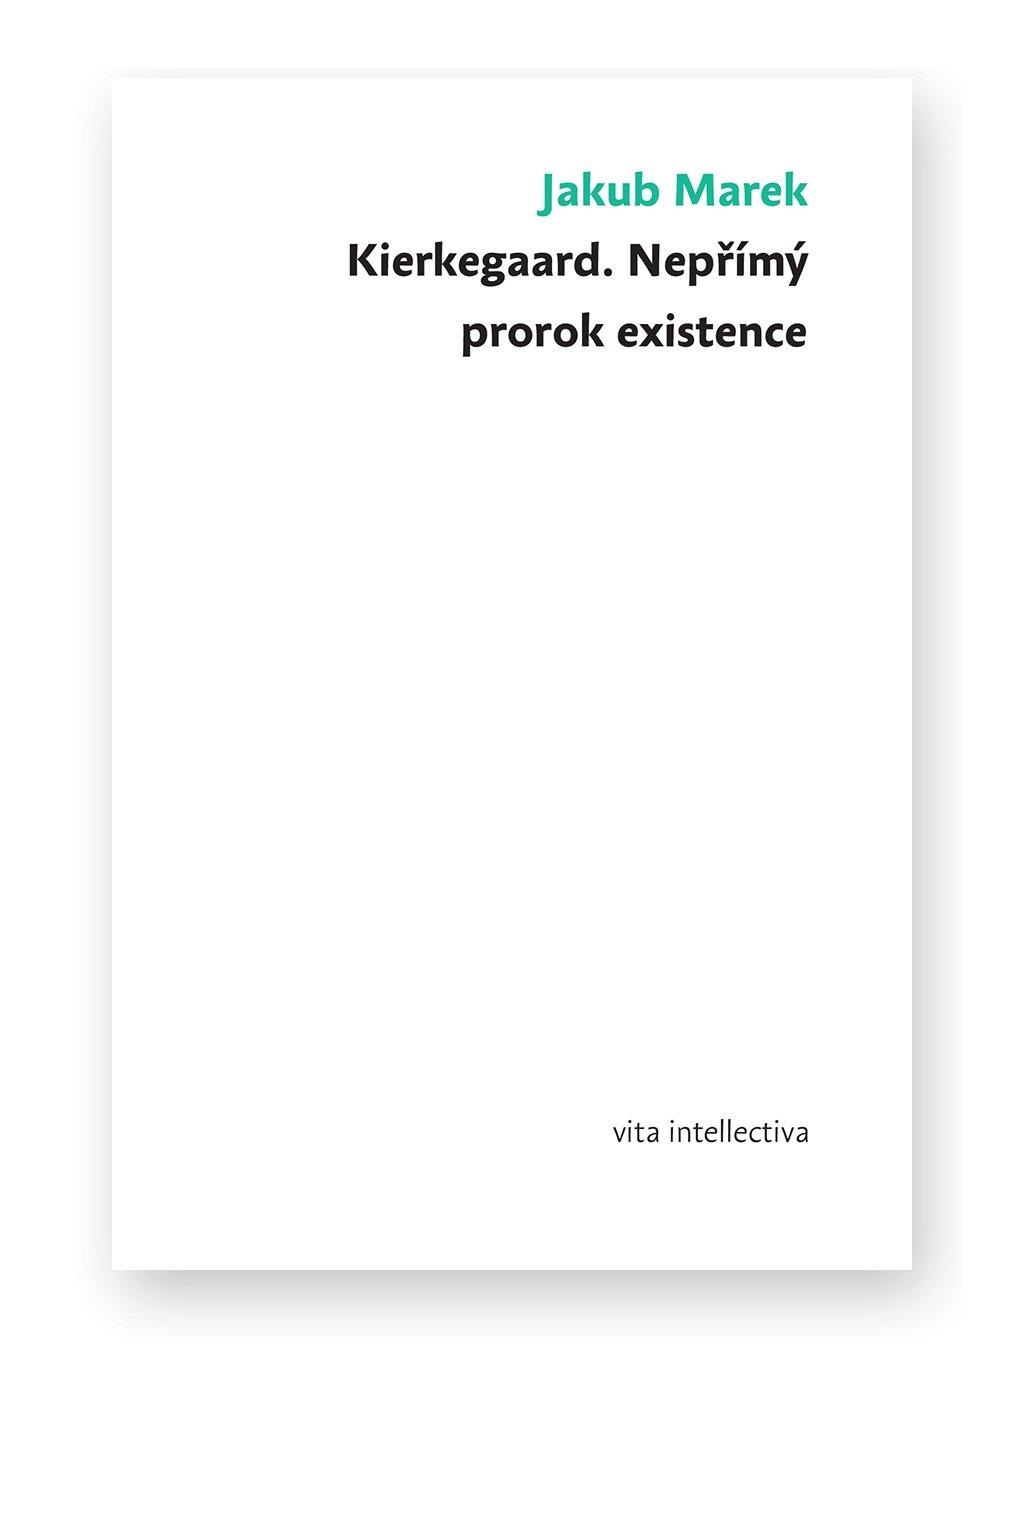 786 kierkegaard neprimy prorok existence